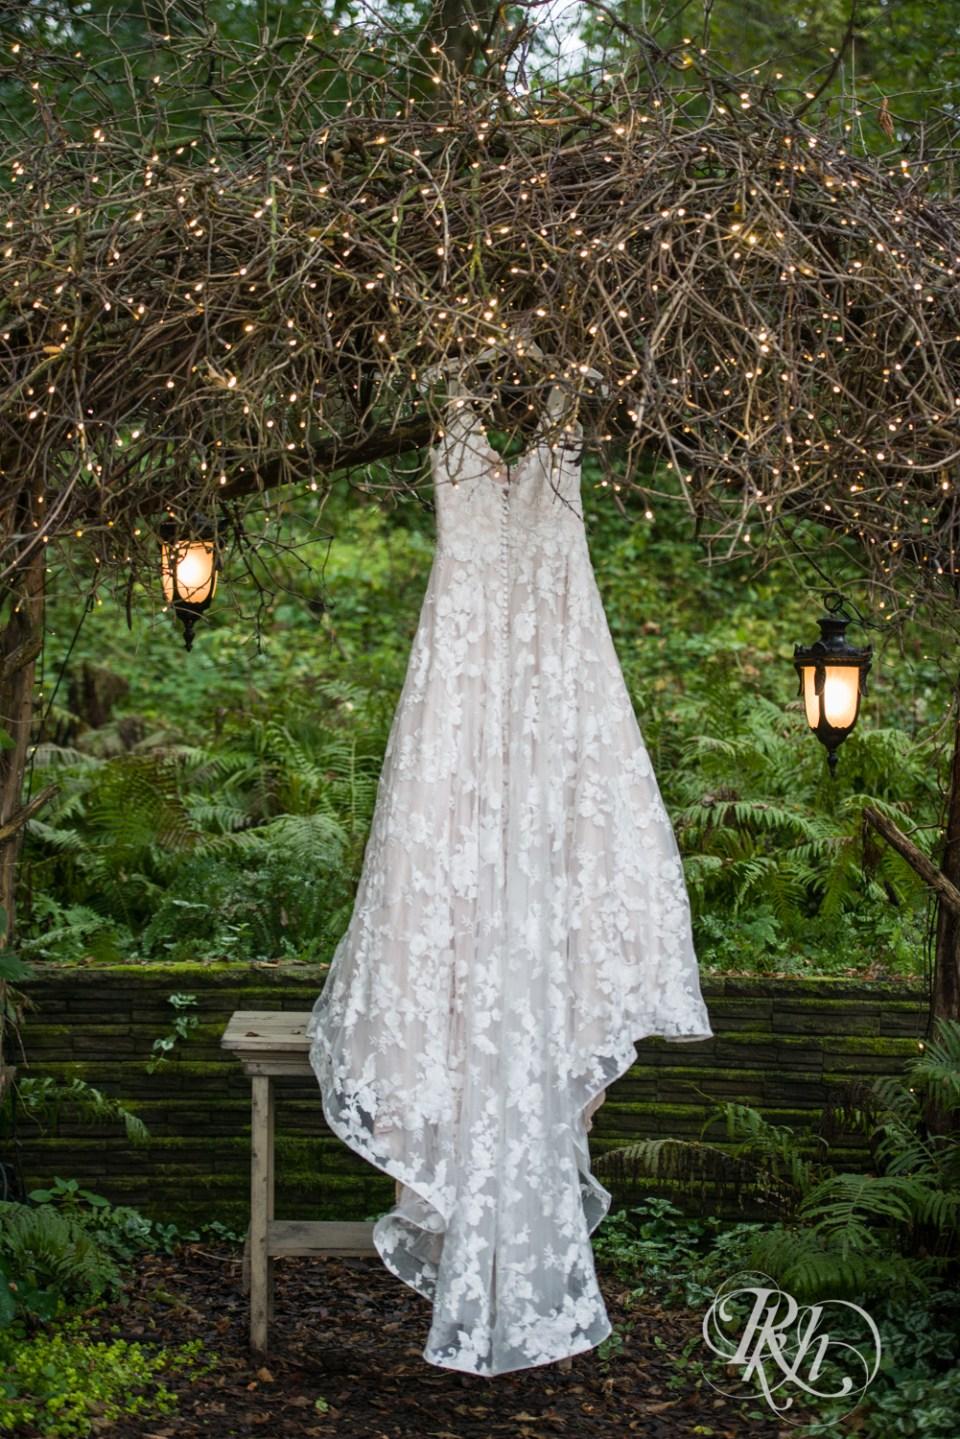 Wedding dress hanging in tree in the rain